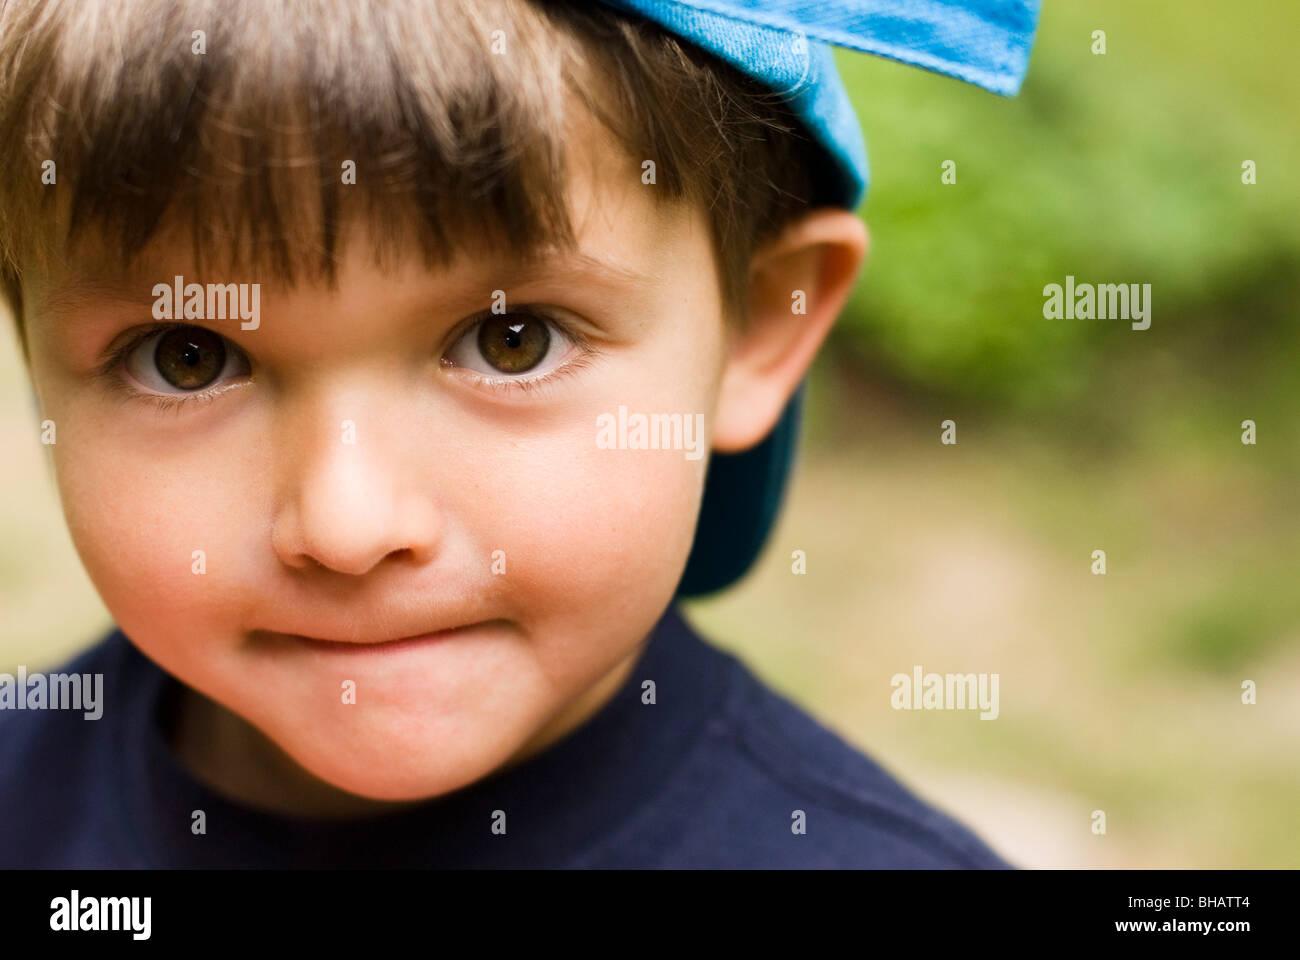 boy looking innocent - Stock Image